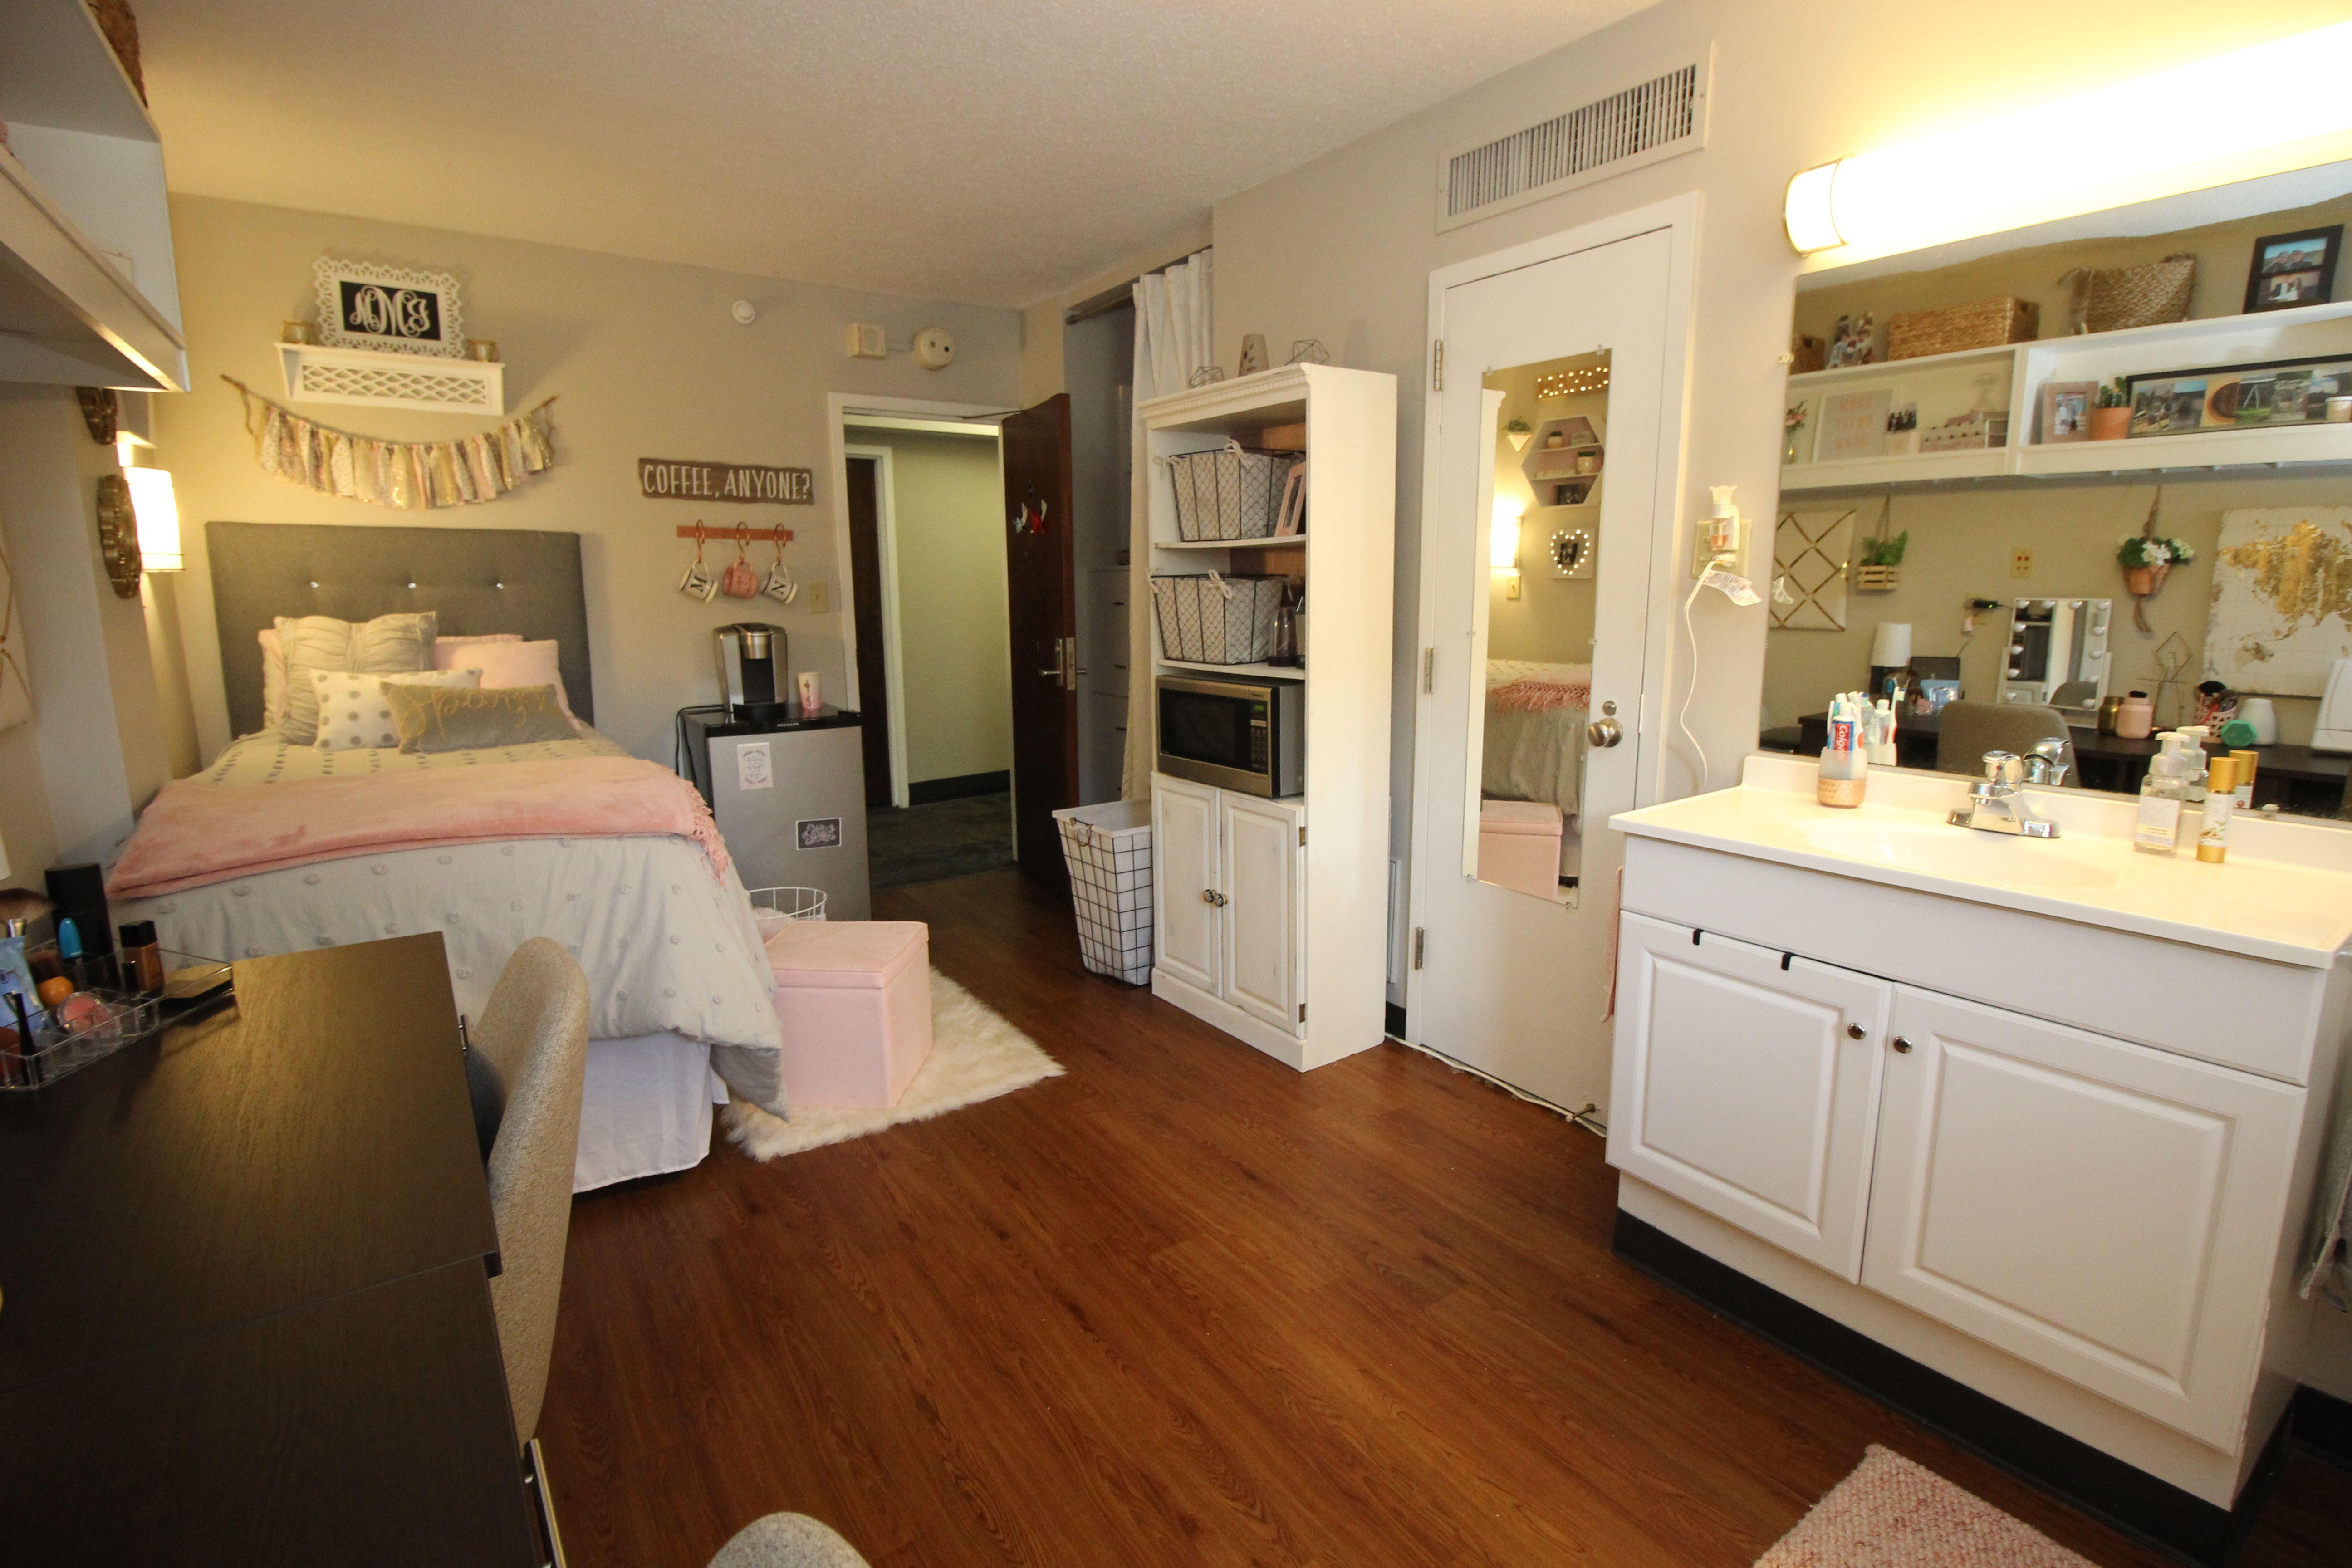 Traditional Double Room Dorm Room Inspiration Girls Dorm Room